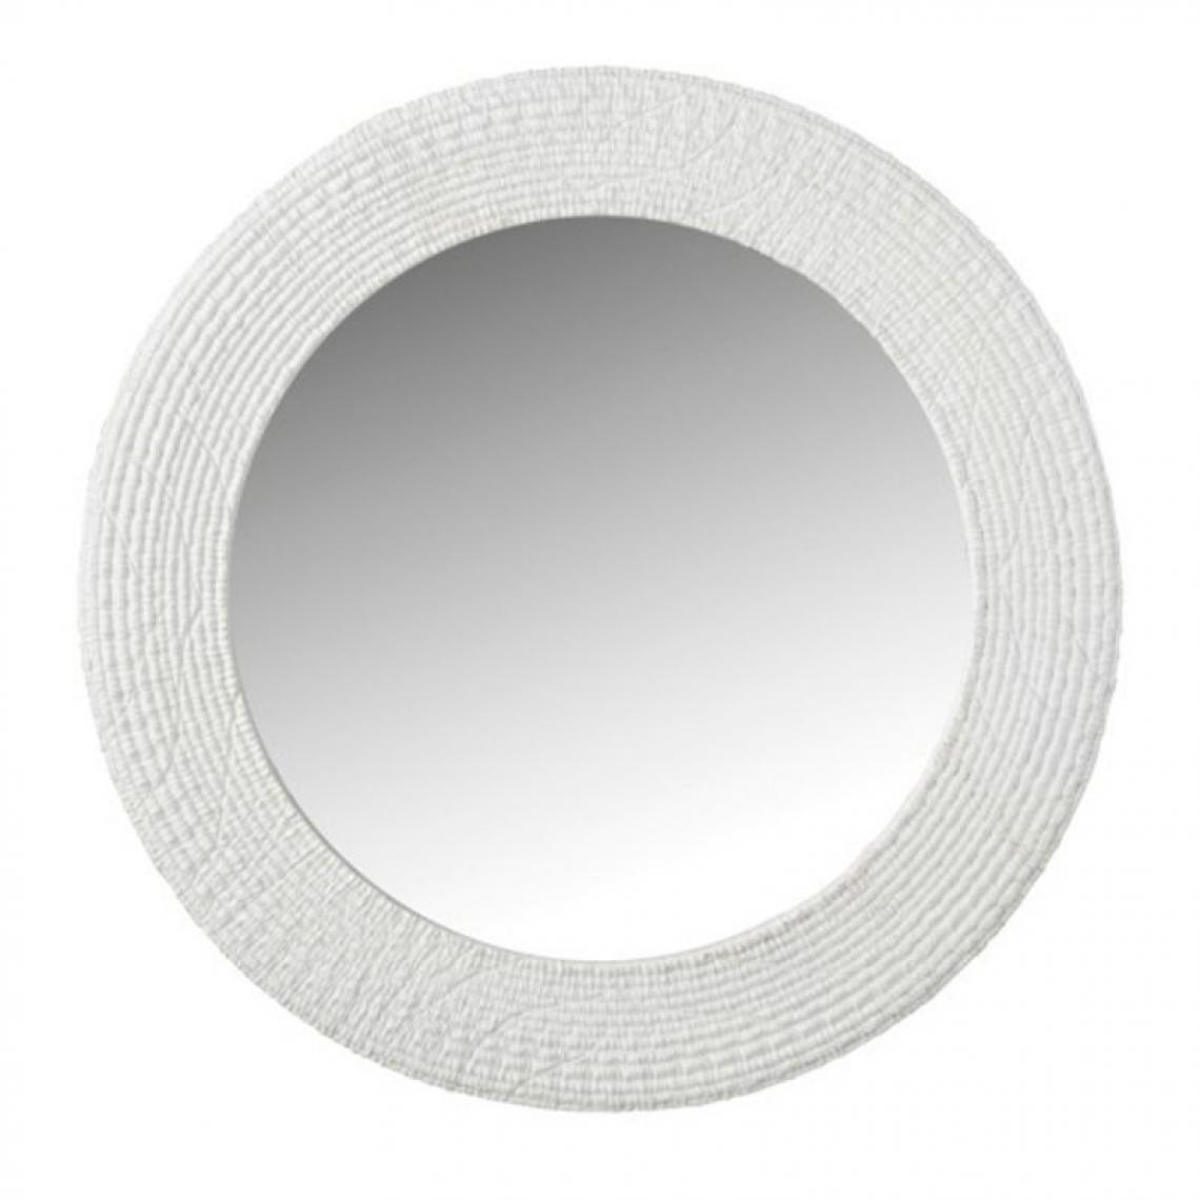 Paris Prix Miroir Mural Rond Design Nervures 50cm Blanc